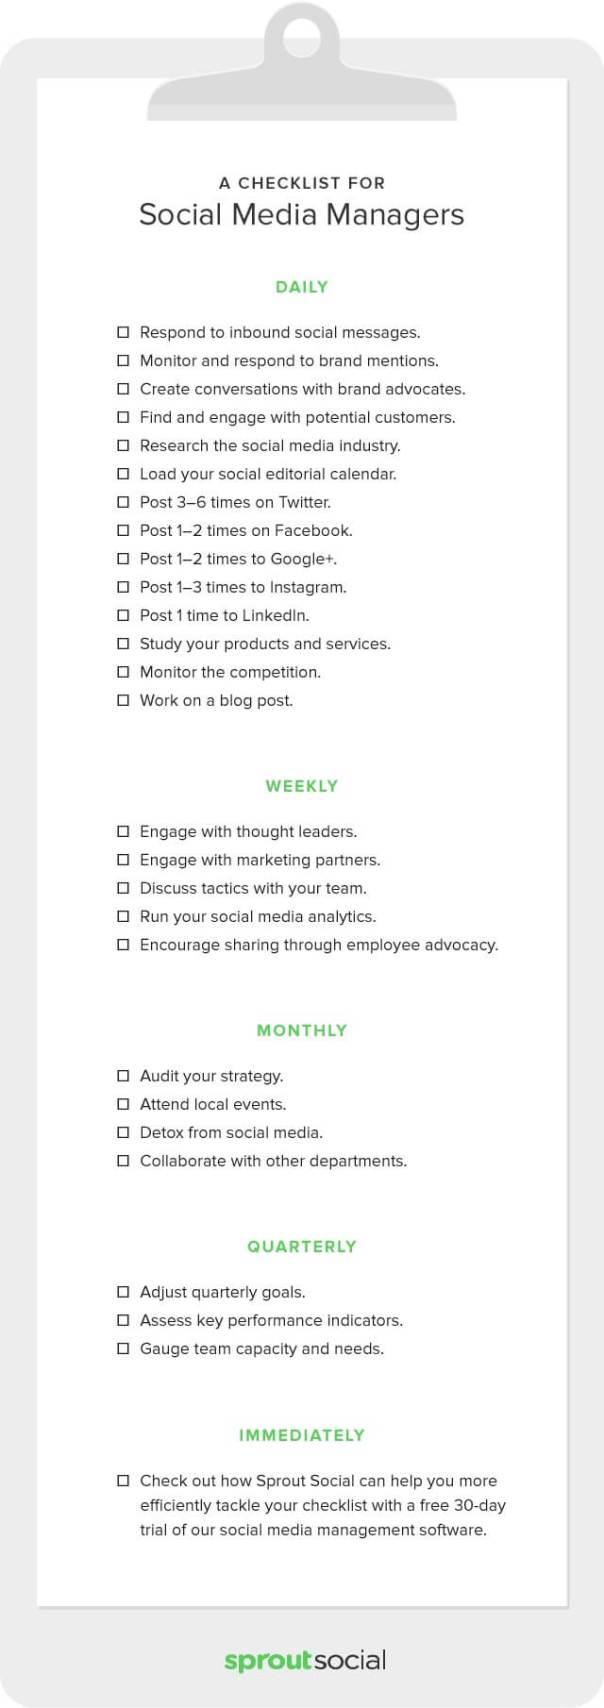 Social-Media-Managers-Checklist-01